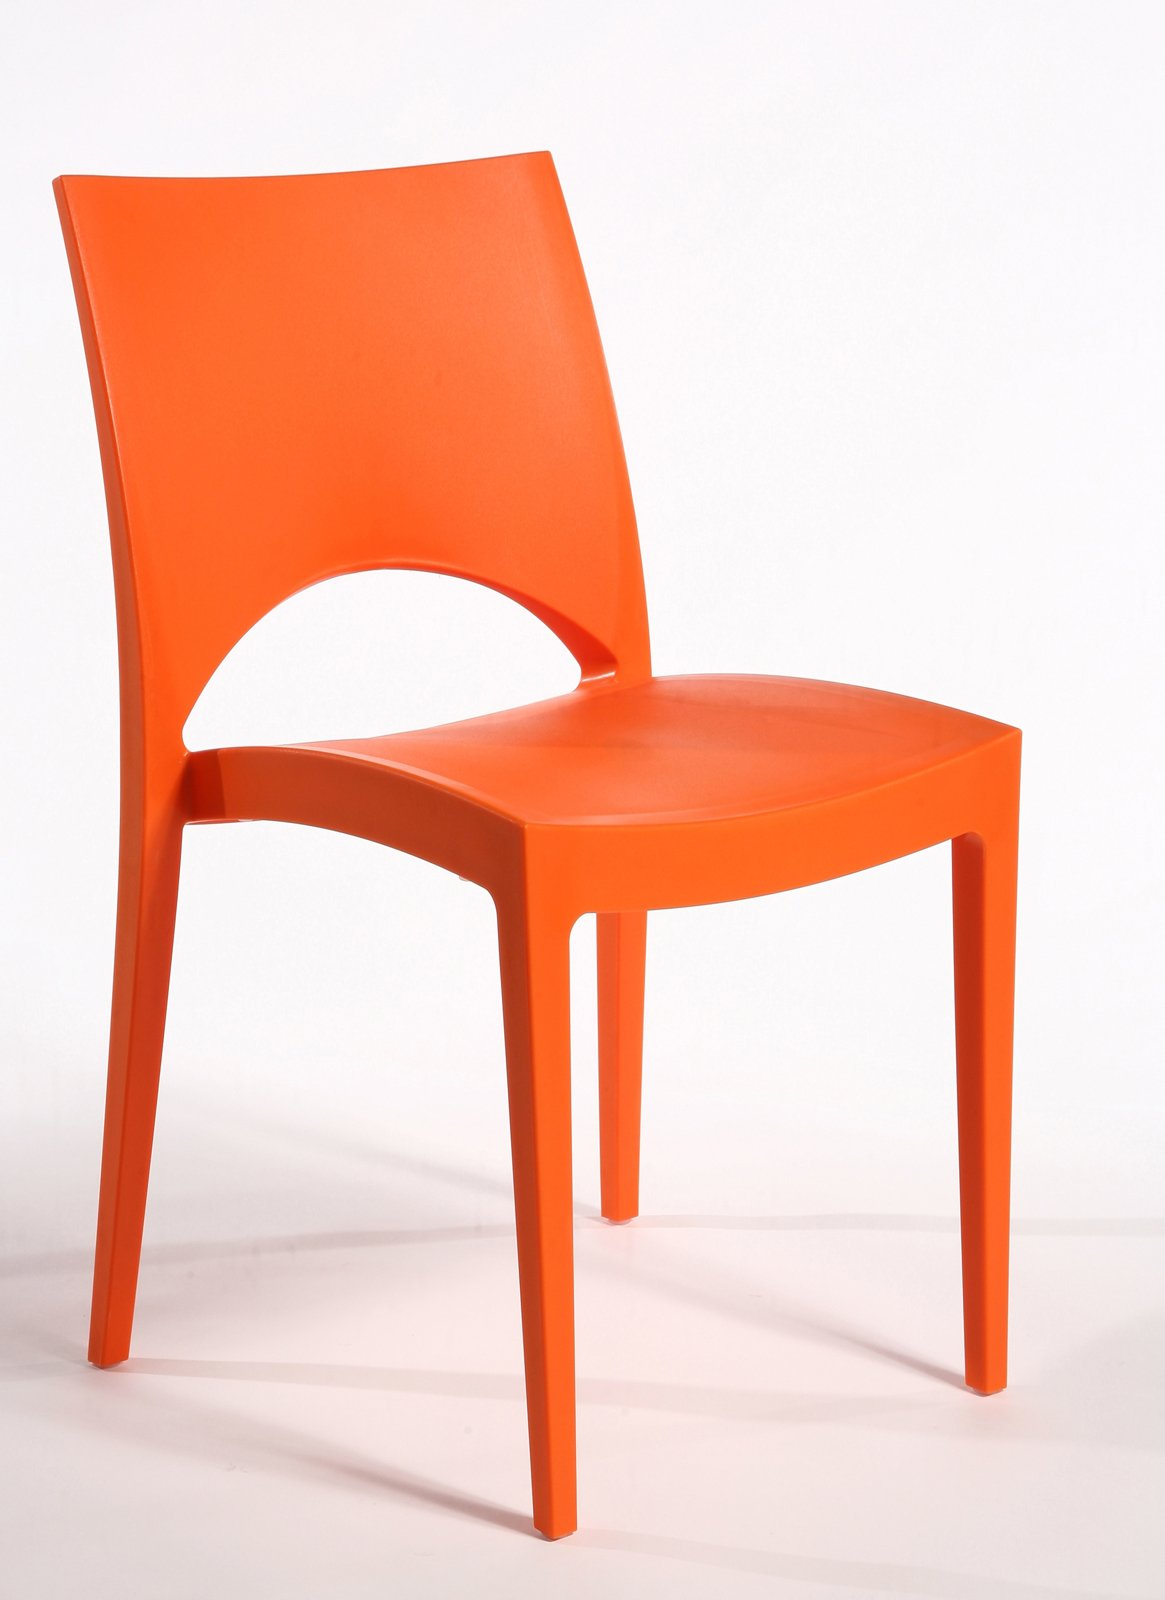 Sedie low cost 15 modelli a meno di 100 euro cose di casa for Sedie x sala da pranzo ikea